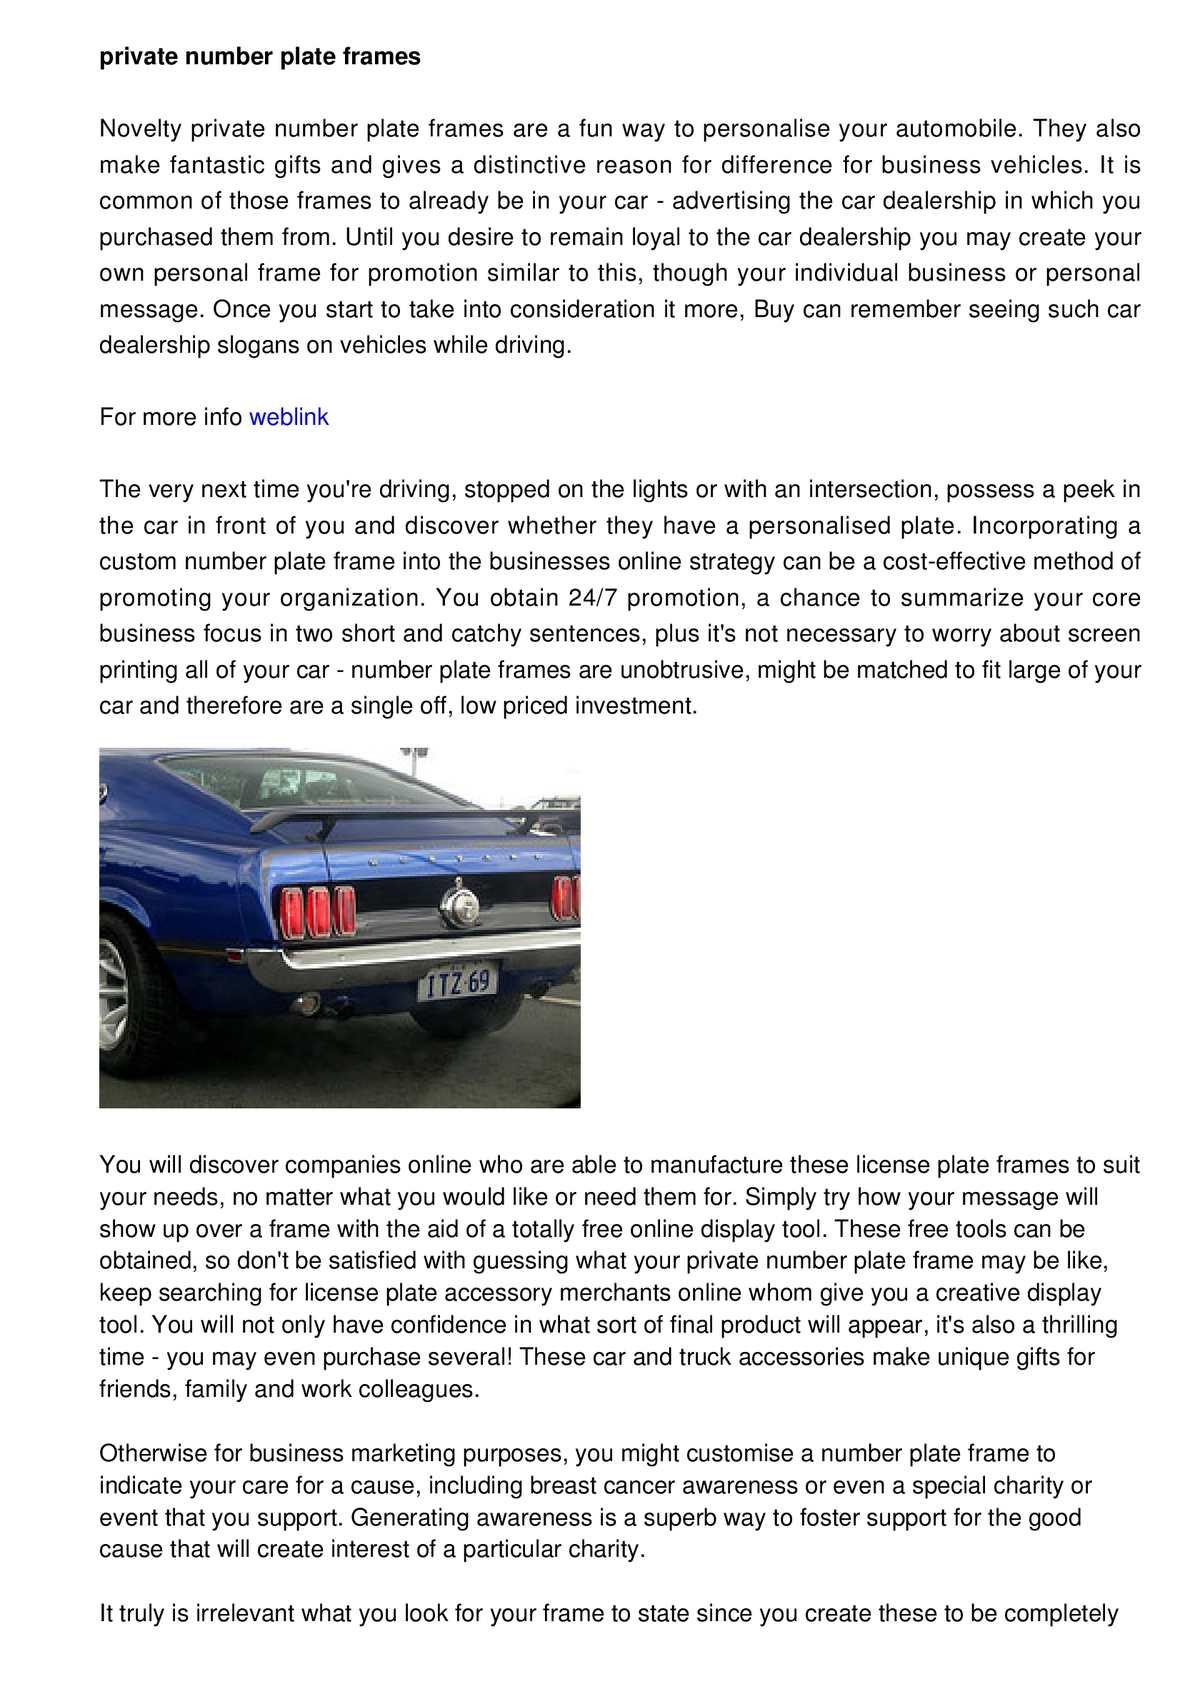 Calaméo - Registration Frames - Personalisation for Your Car